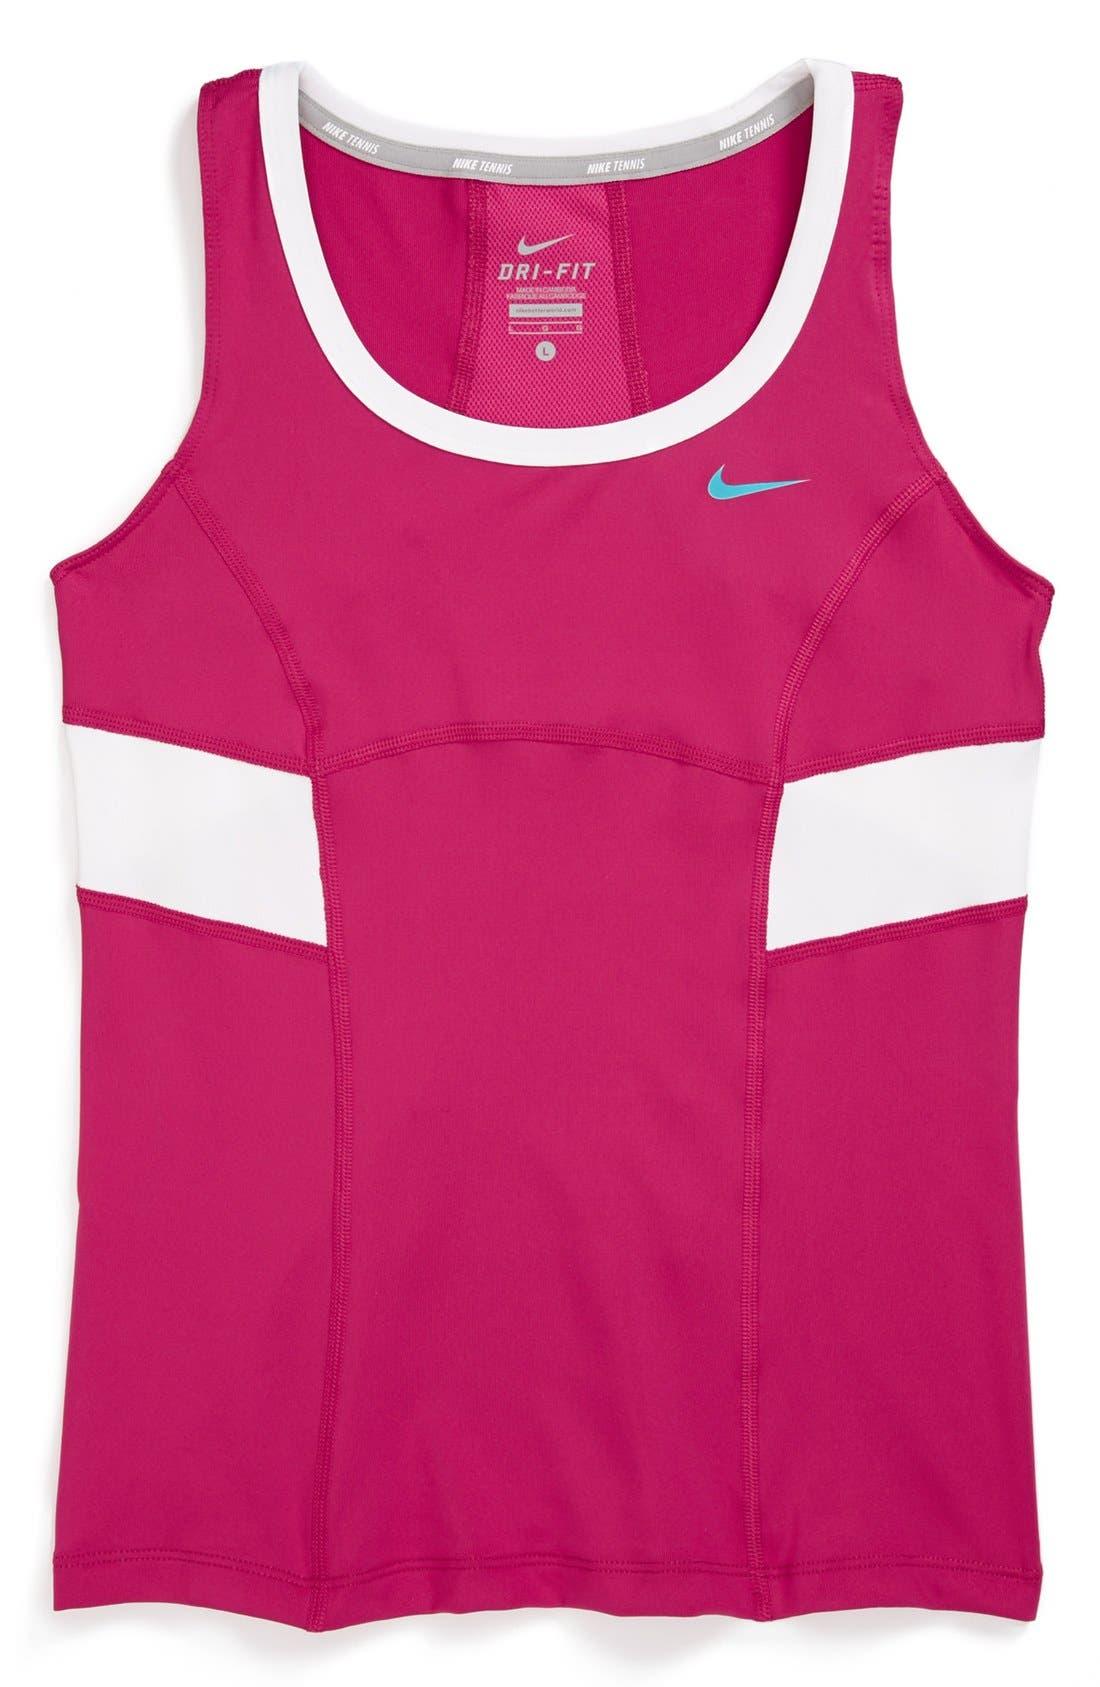 Main Image - Nike 'Power' Tennis Tank Top (Big Girls)